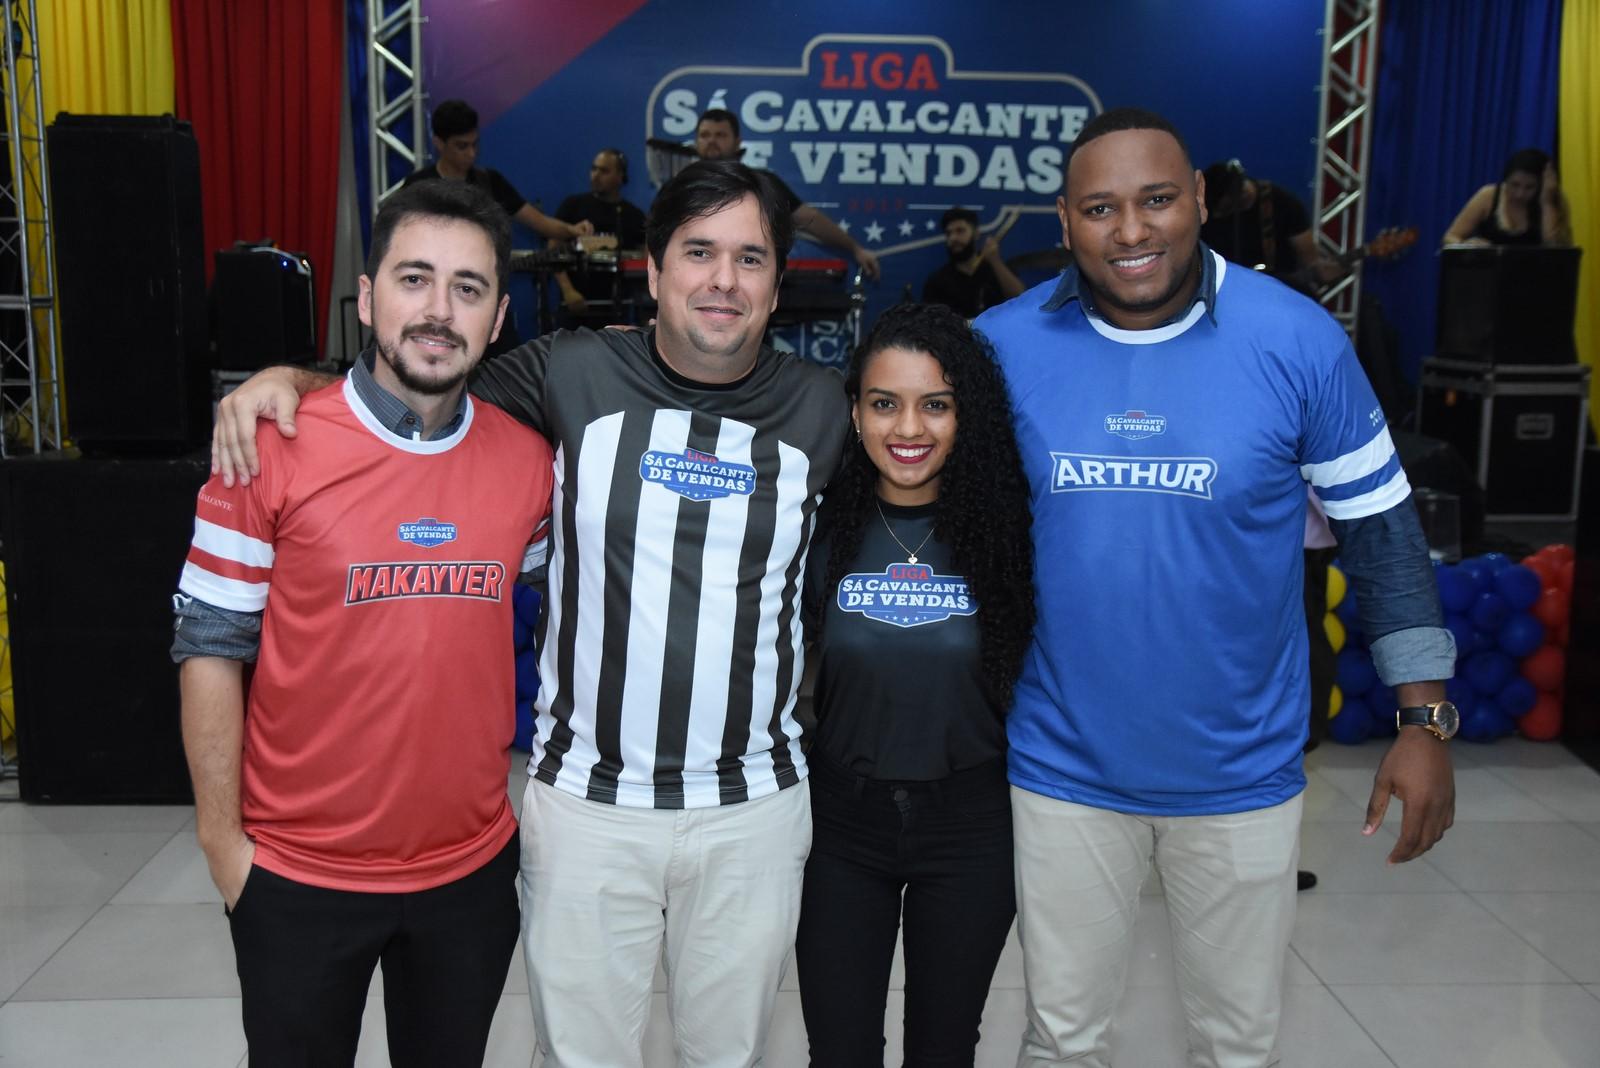 Paulo Makayver (Gerente de Vendas Sá), Diego Freire, Raissa Silva (Comercial Sá Cavalcante) e  Arthur Santos (Gerente de Vendas Sá)